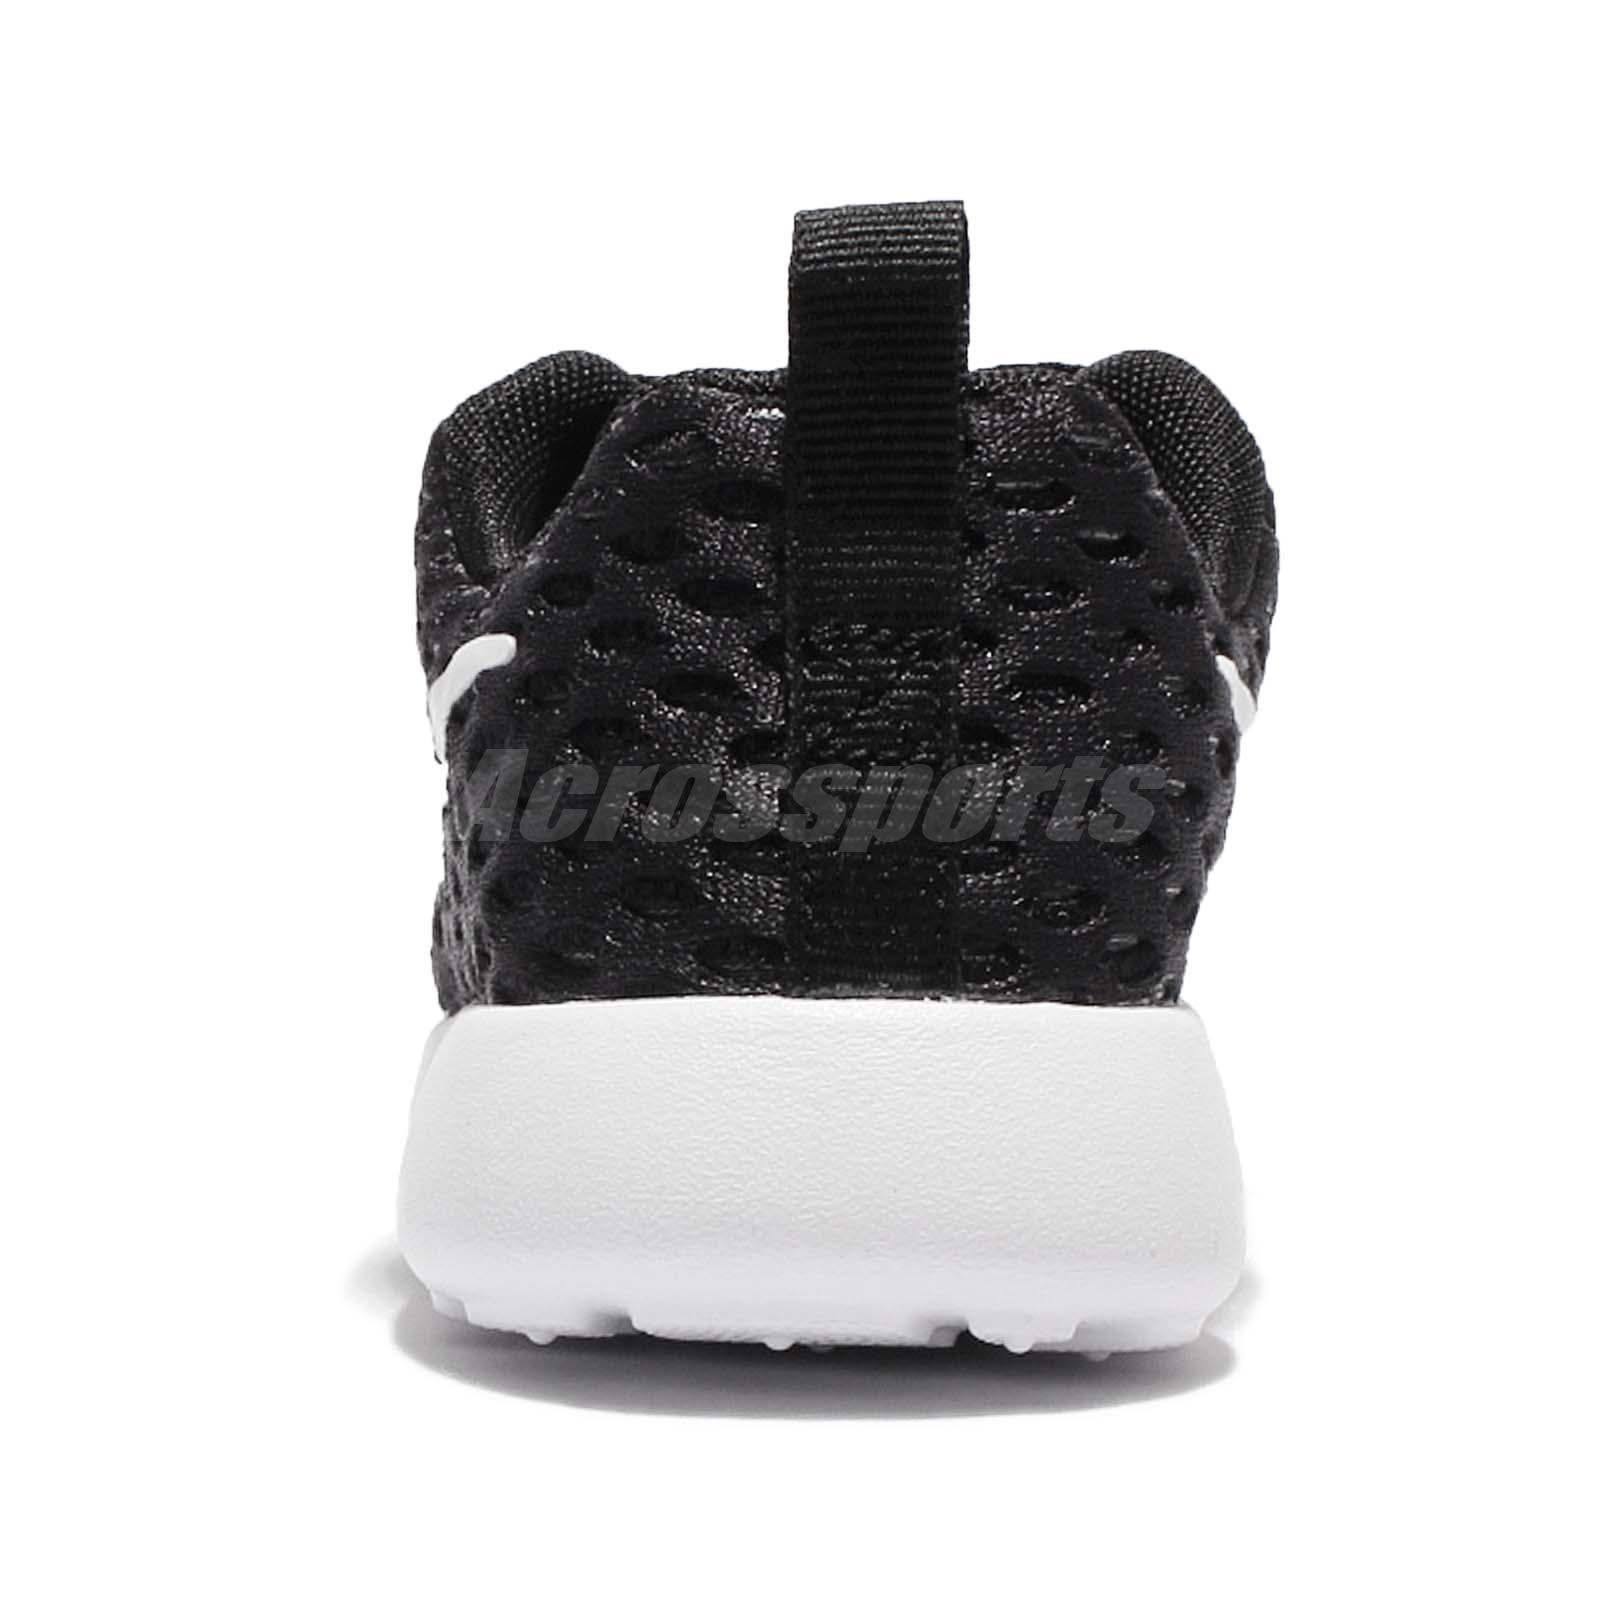 on sale 7cacf de1d8 nike roshe one flight weight tdv black toddler baby  running shoes 819691 008 - semanariodelnorte.com d64f1592e1c6